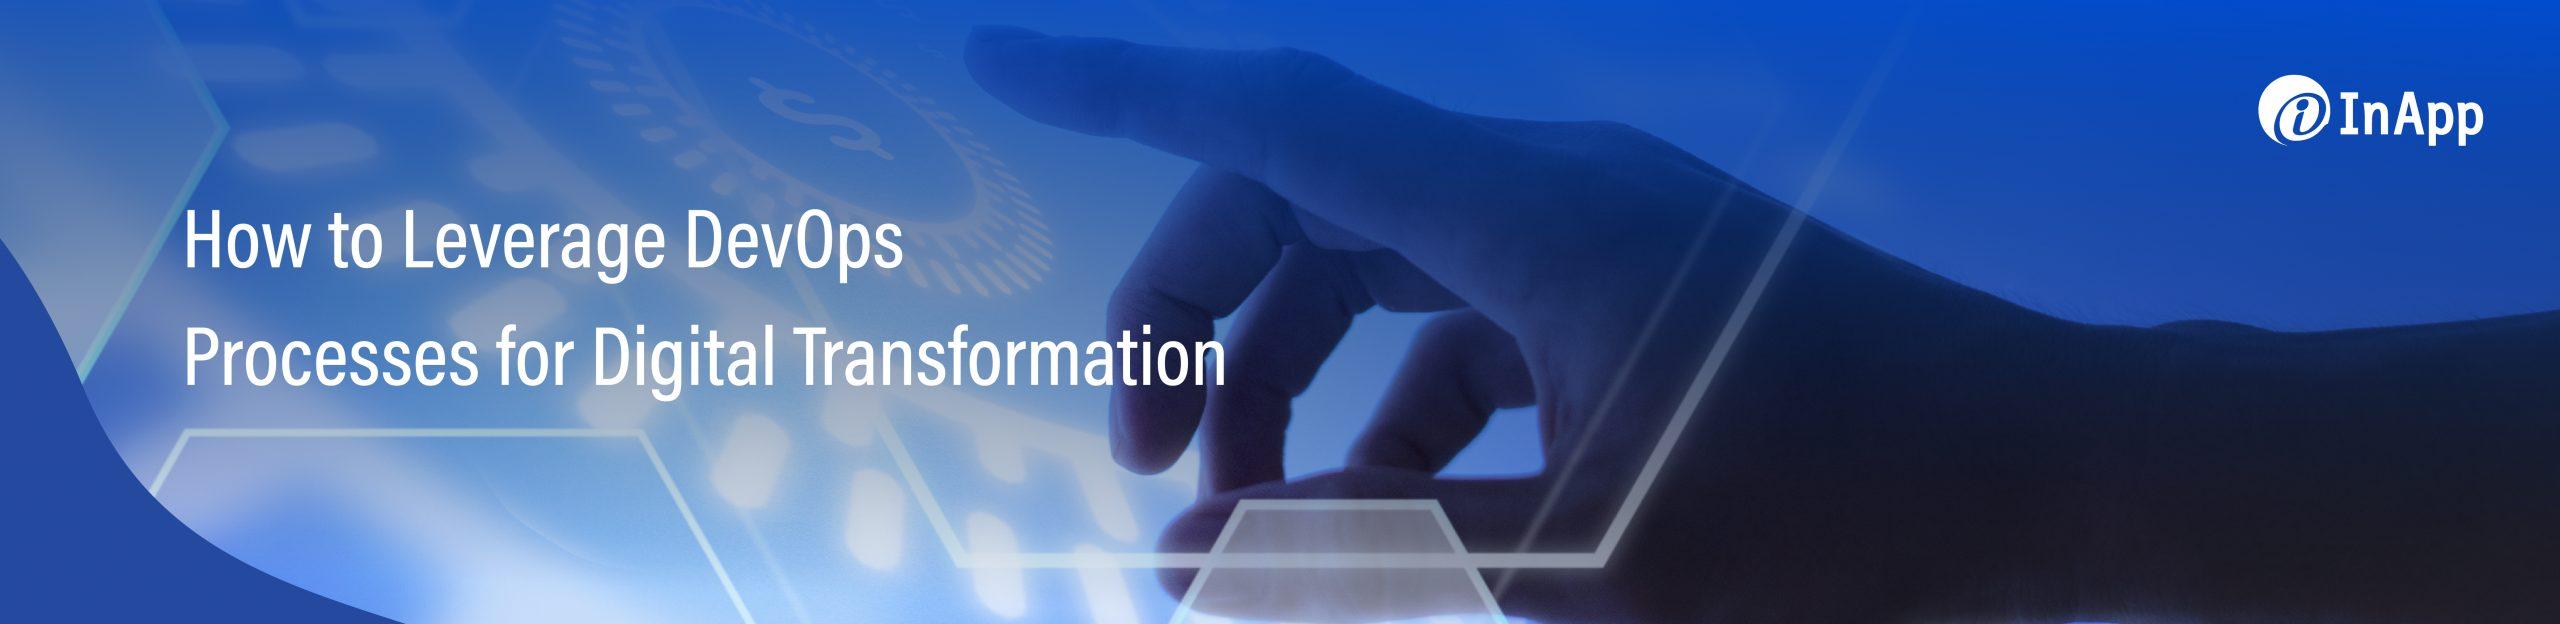 How to Leverage DevOps Processes for Digital Transformation Internal